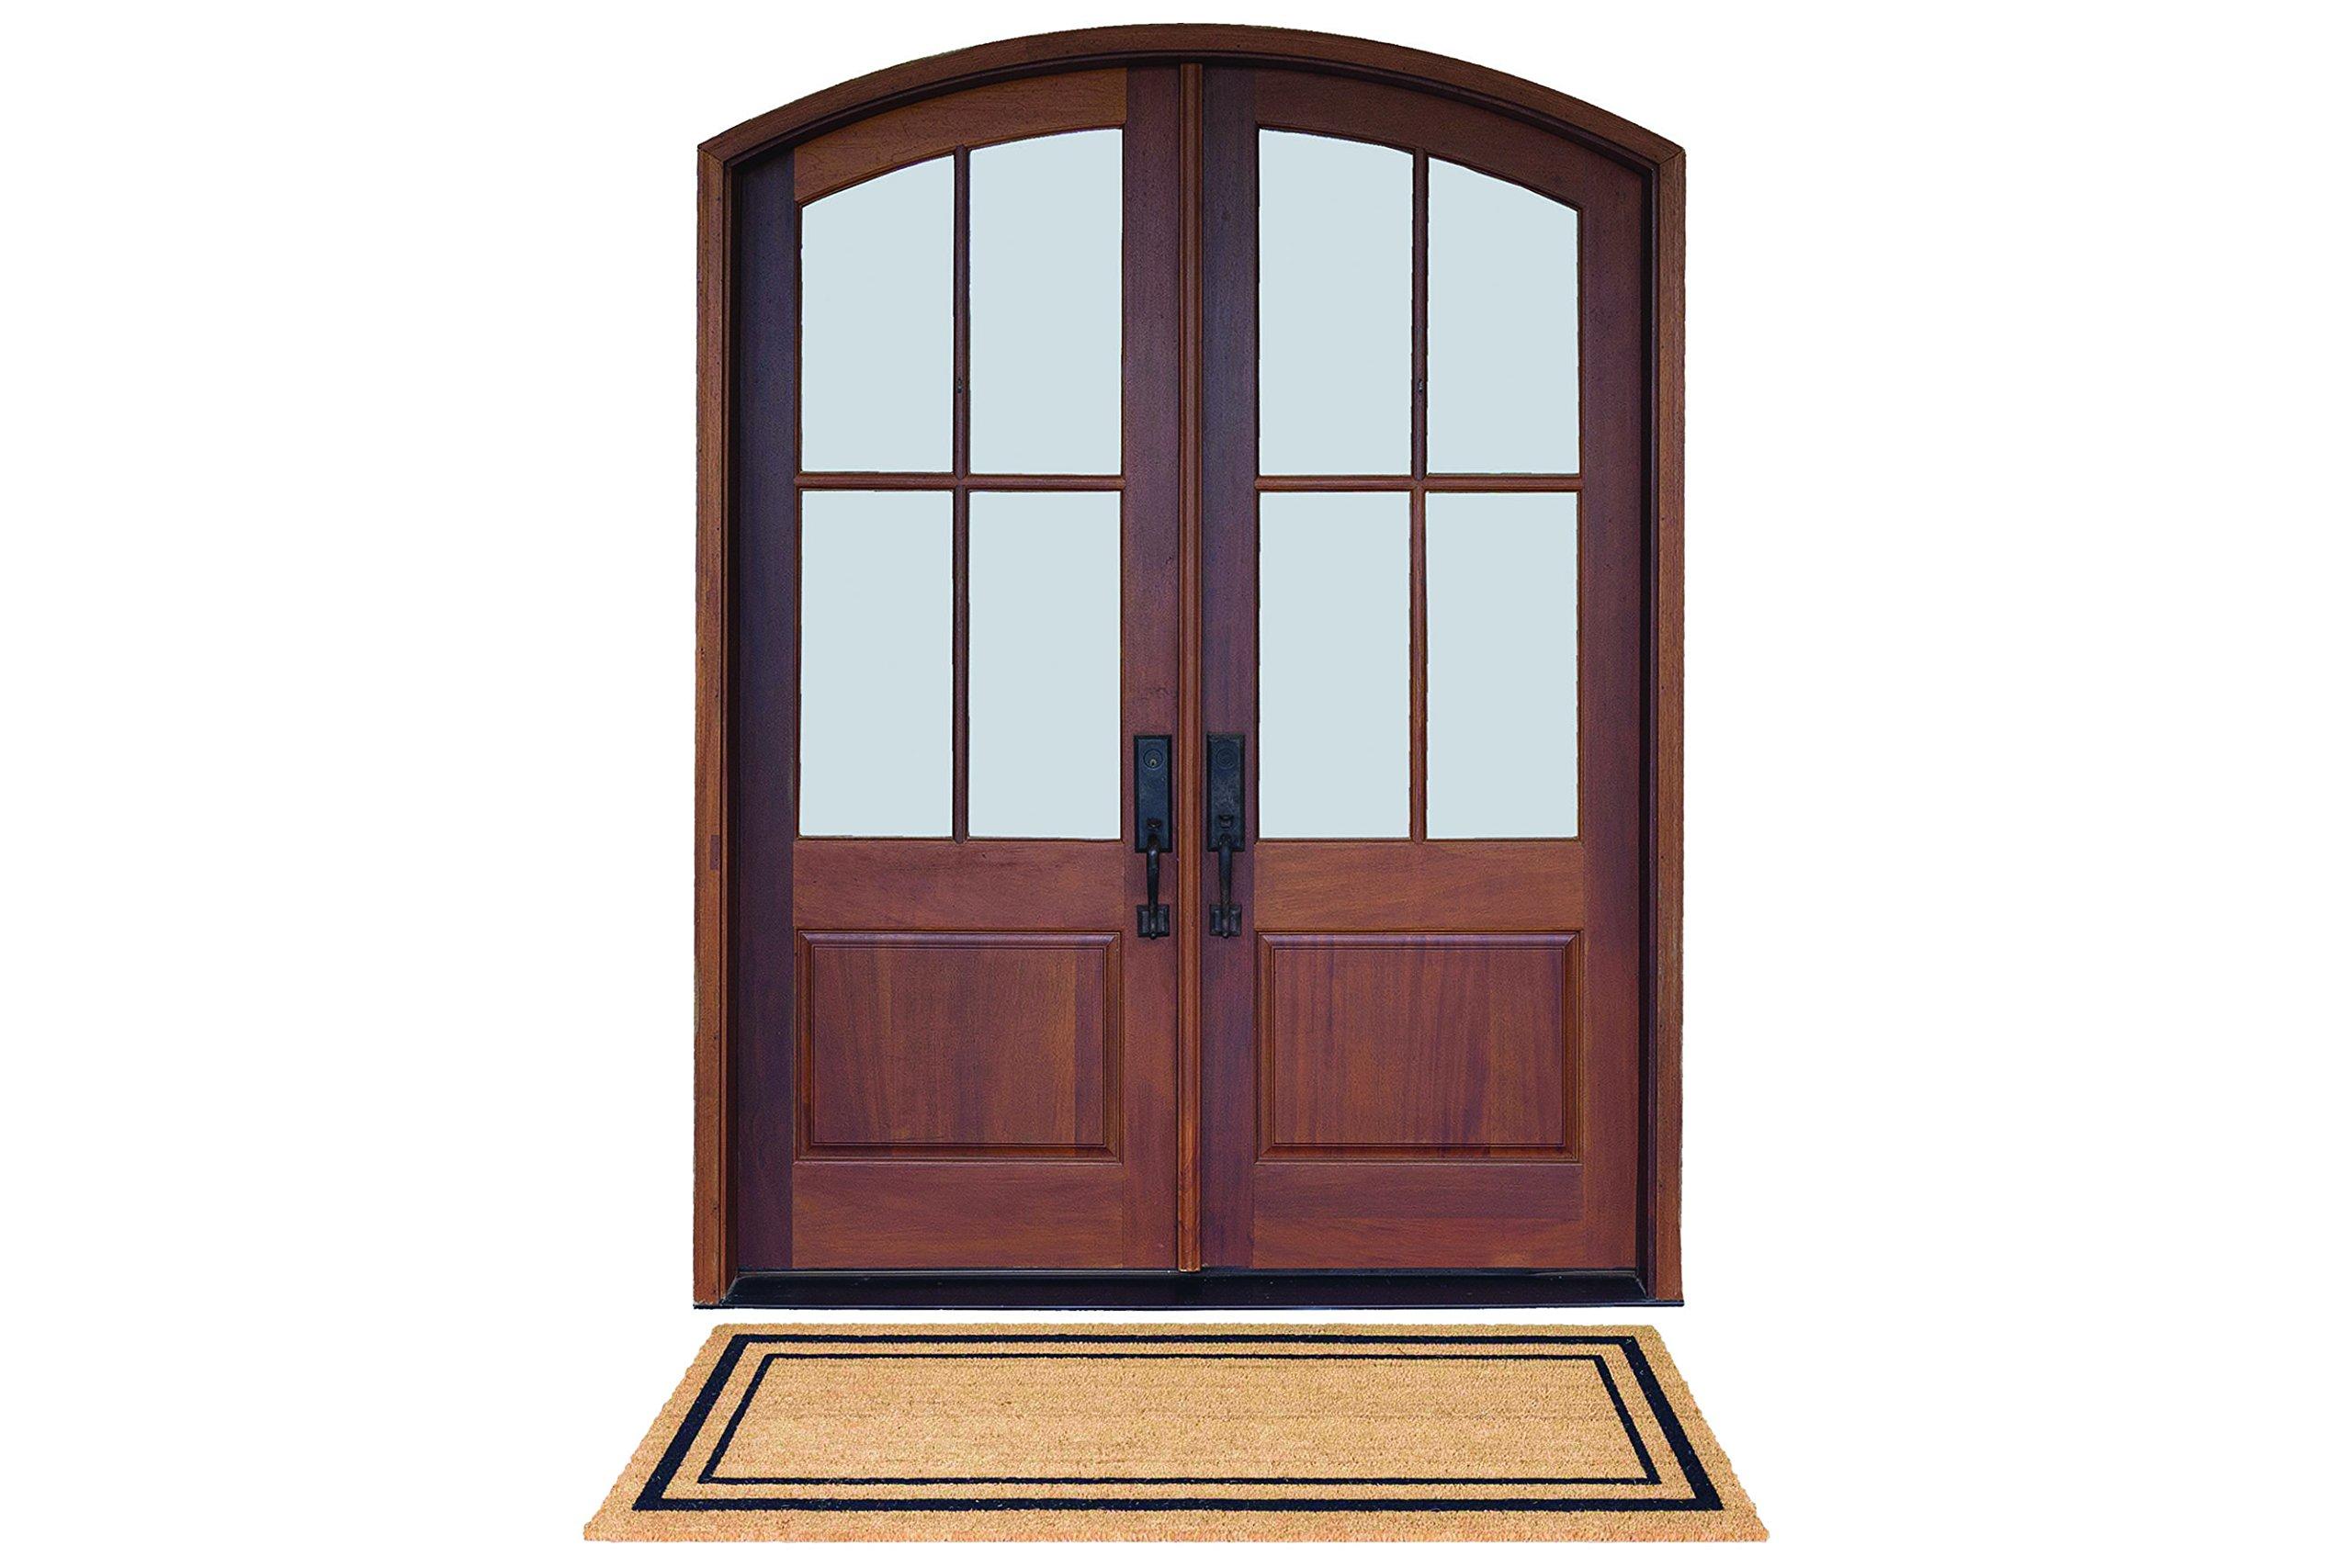 DeCoir 24'' x 60'' 'Classic Border' Large Coir Double Door Mat